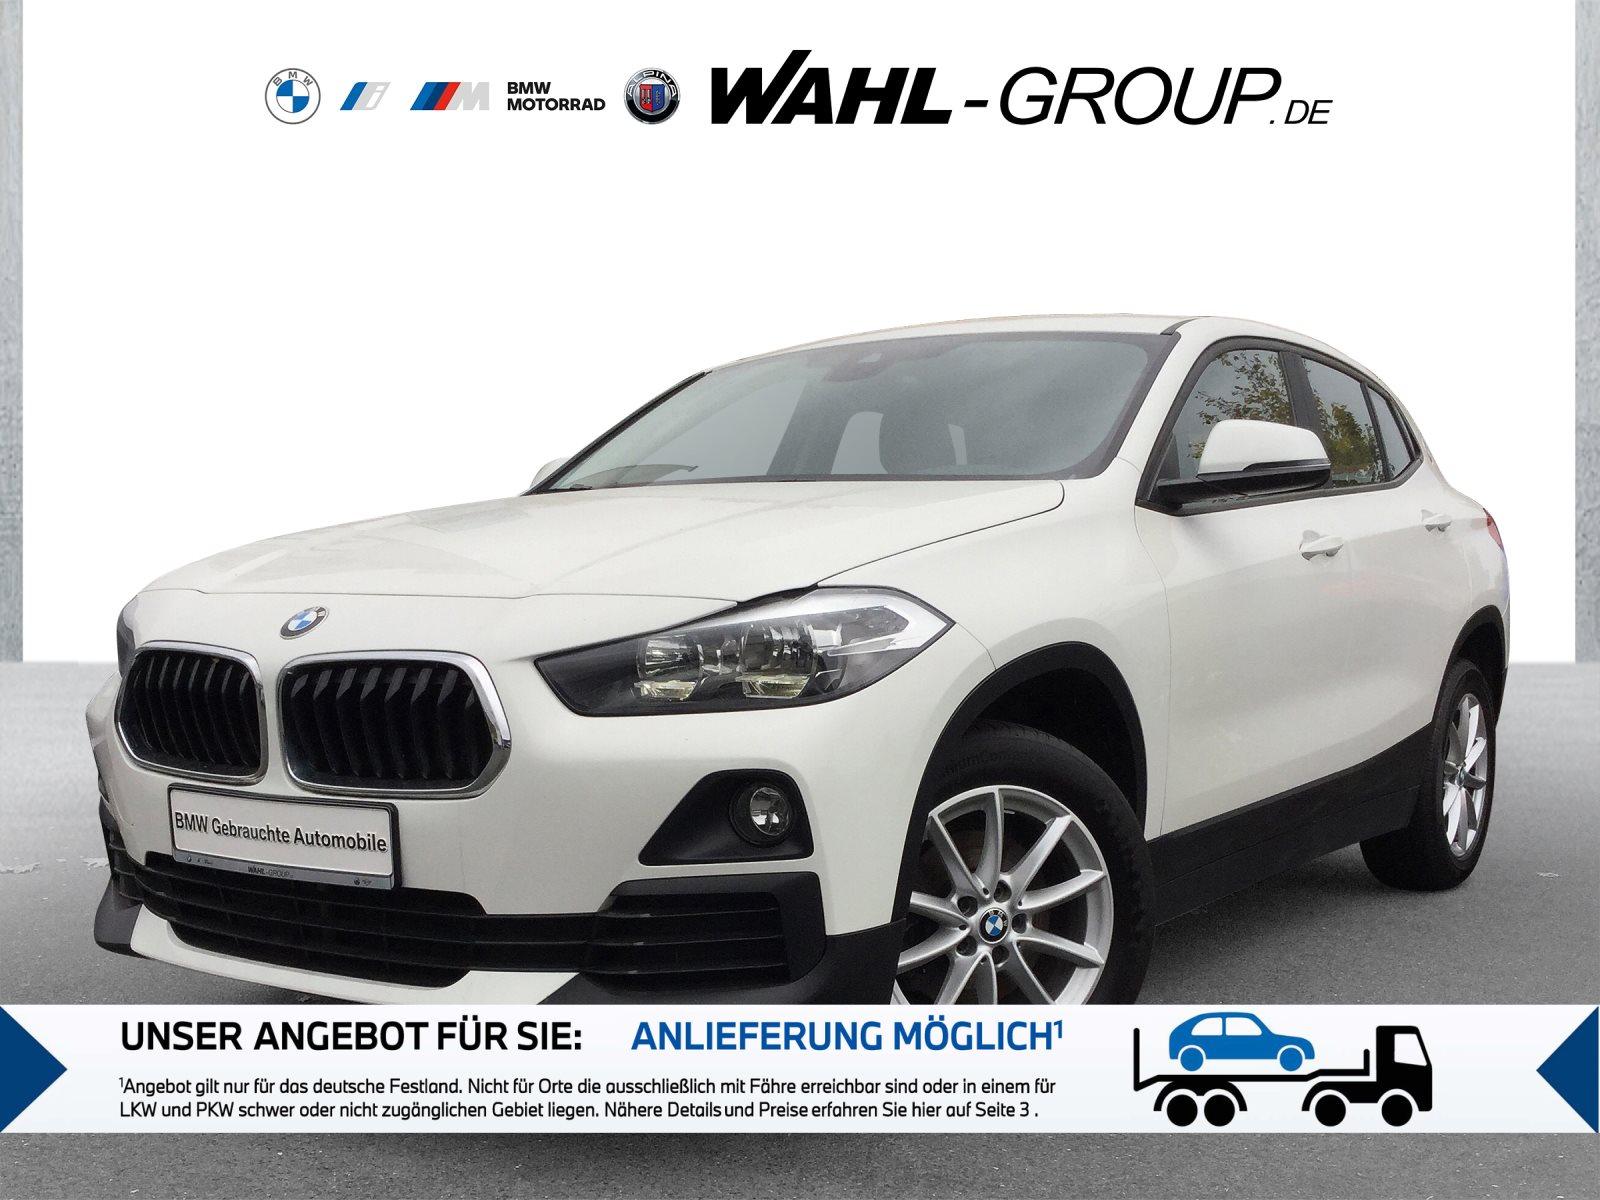 BMW X2 sDrive18d Advantage Navi Tempomat AHK Shz, Jahr 2018, Diesel